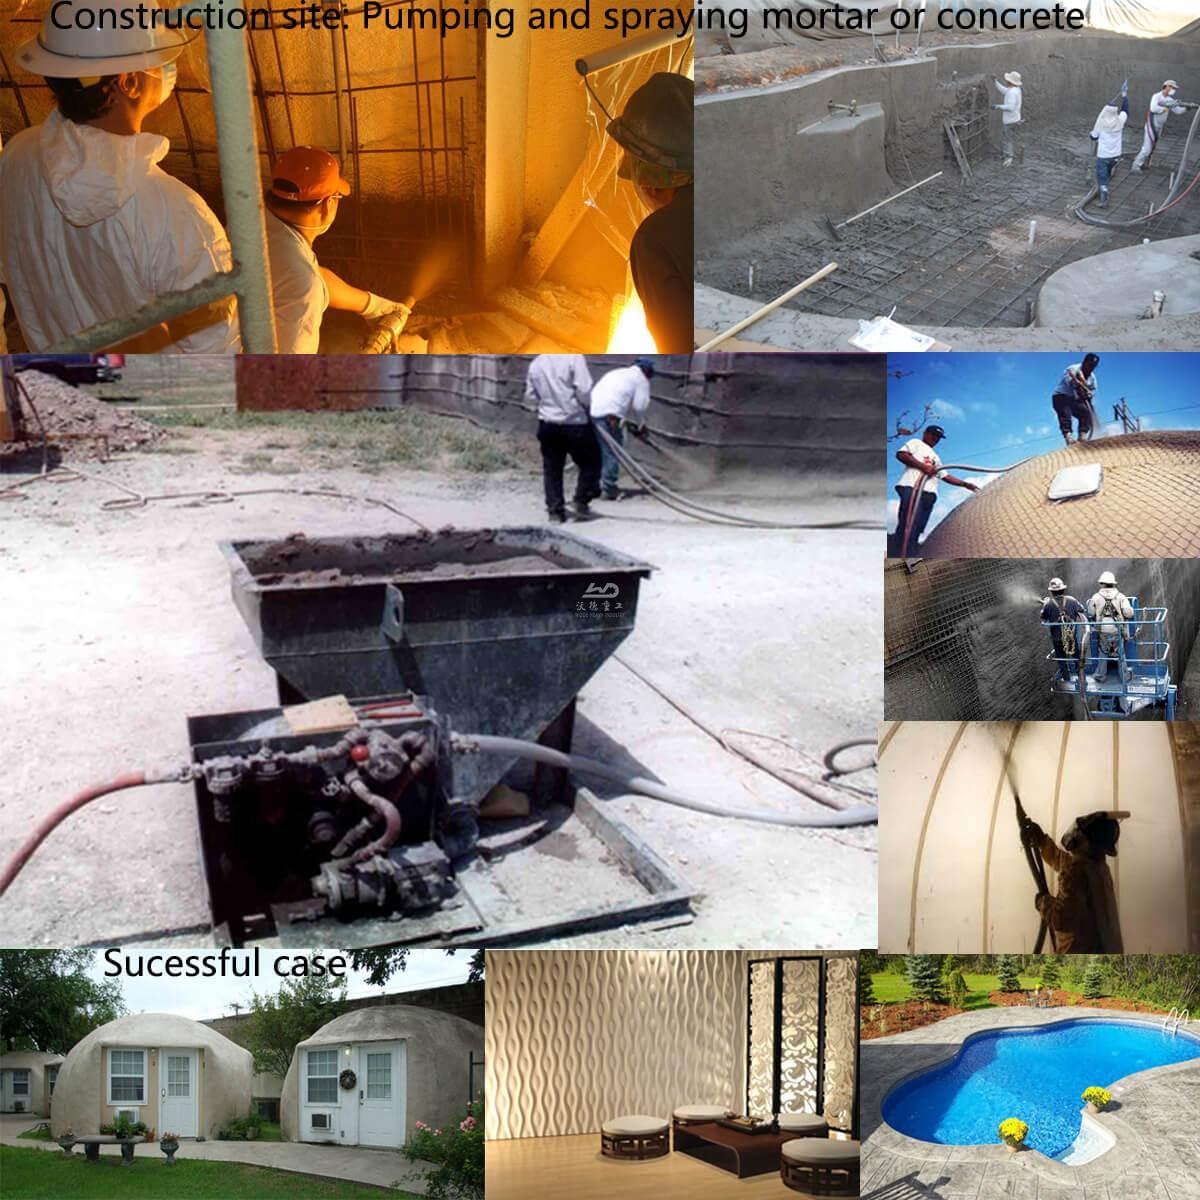 WDS2000E electricshotcretepumpequipmentSingapore applications (1)Building dome, swimming pool etc; (2)Pump and spray normal concrete; (3)Pump and spray mortar/plaster; (4)Pump and spray cellular light concrete.